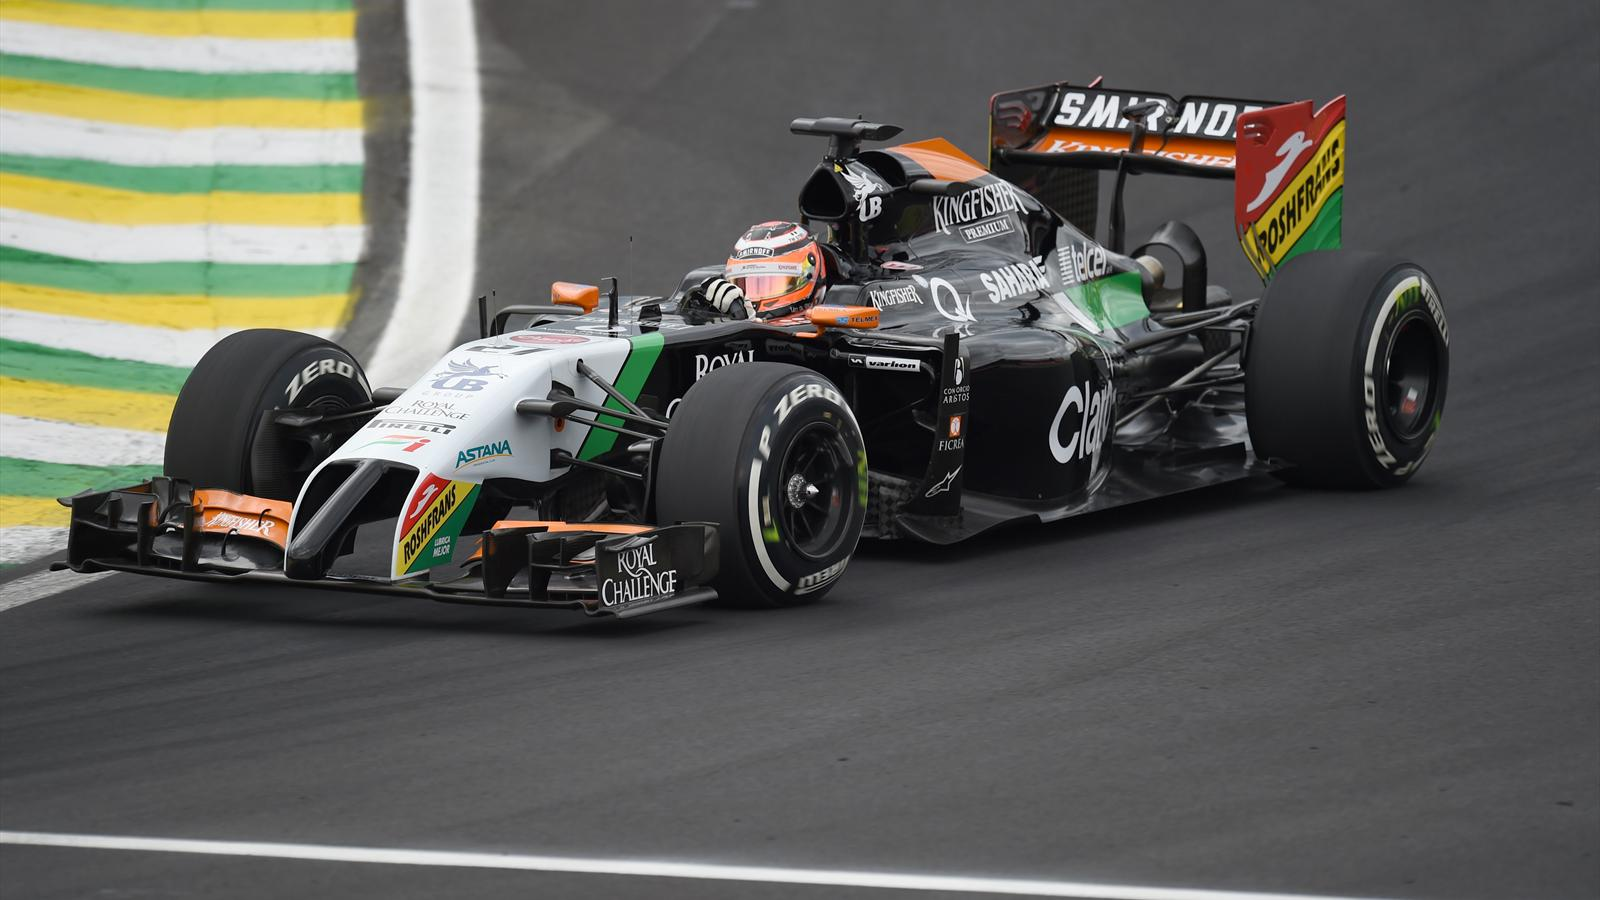 Force India defends blocking Marussia resurrection - Formula 1 - Eurosport